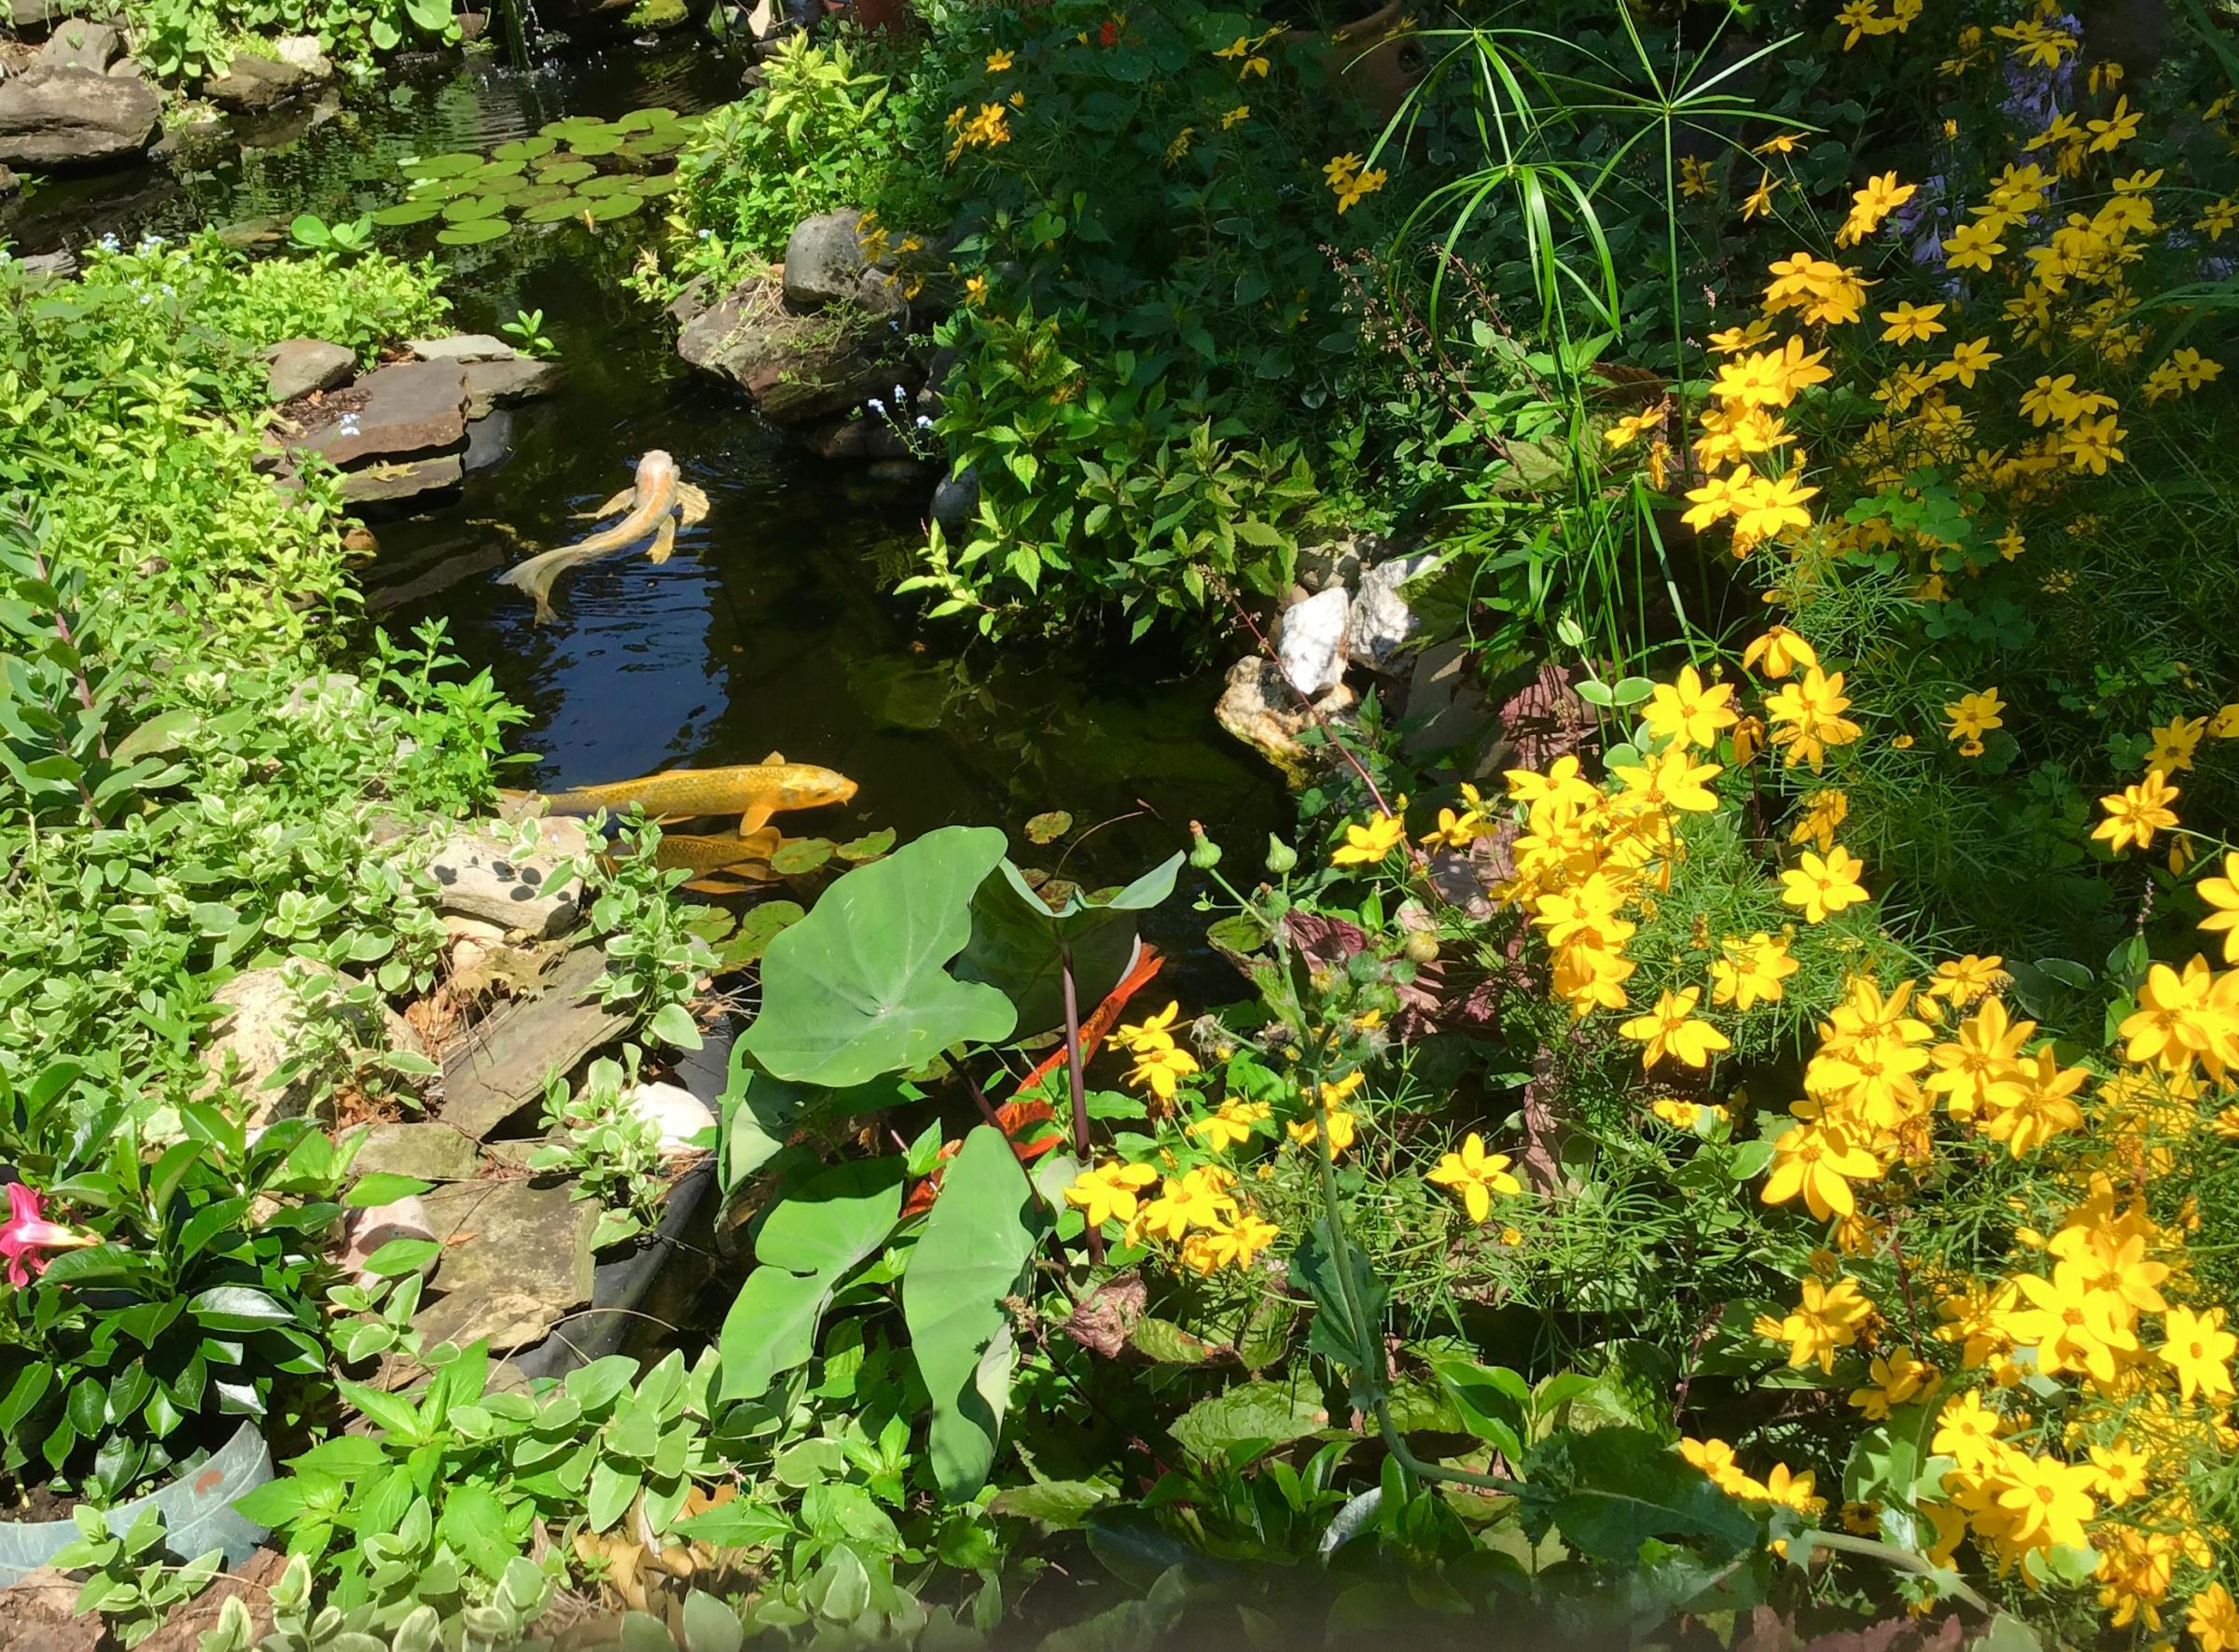 Coreopsis in bloom-d1504419-2206-4634-8994-a563007e5ee1.jpg